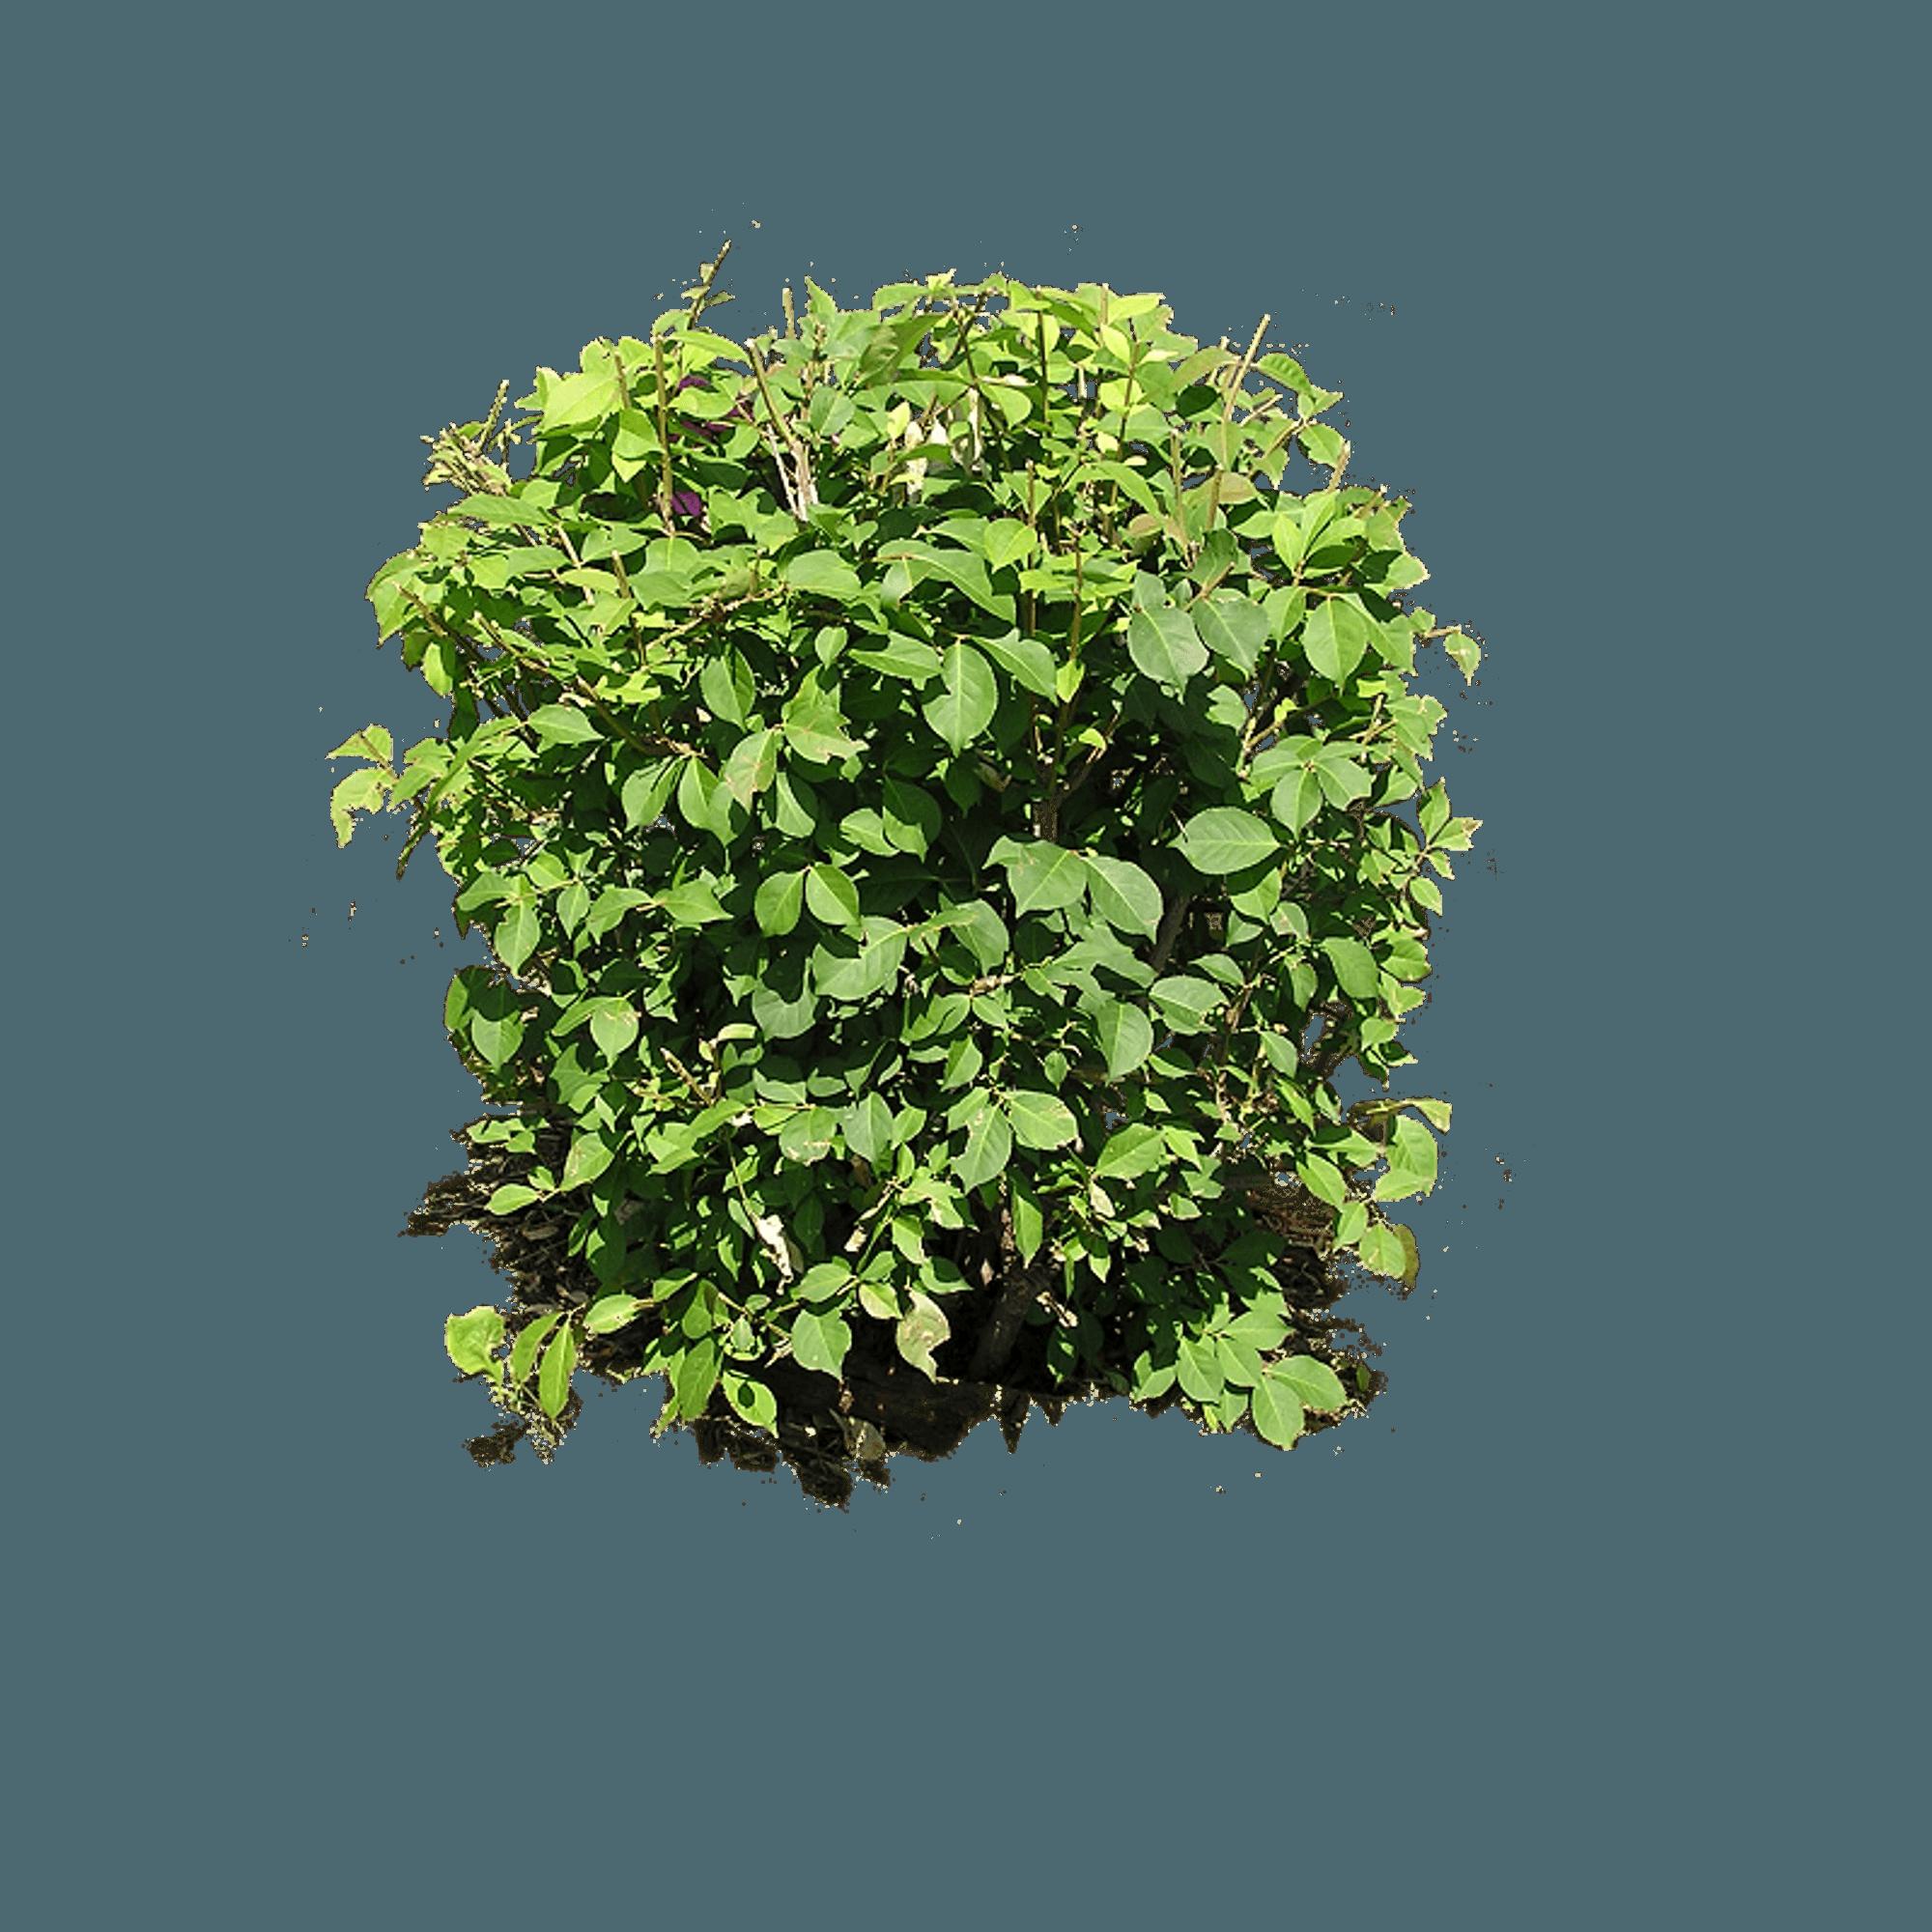 image royalty free Hedges small bush free. Bushes clipart azalea.